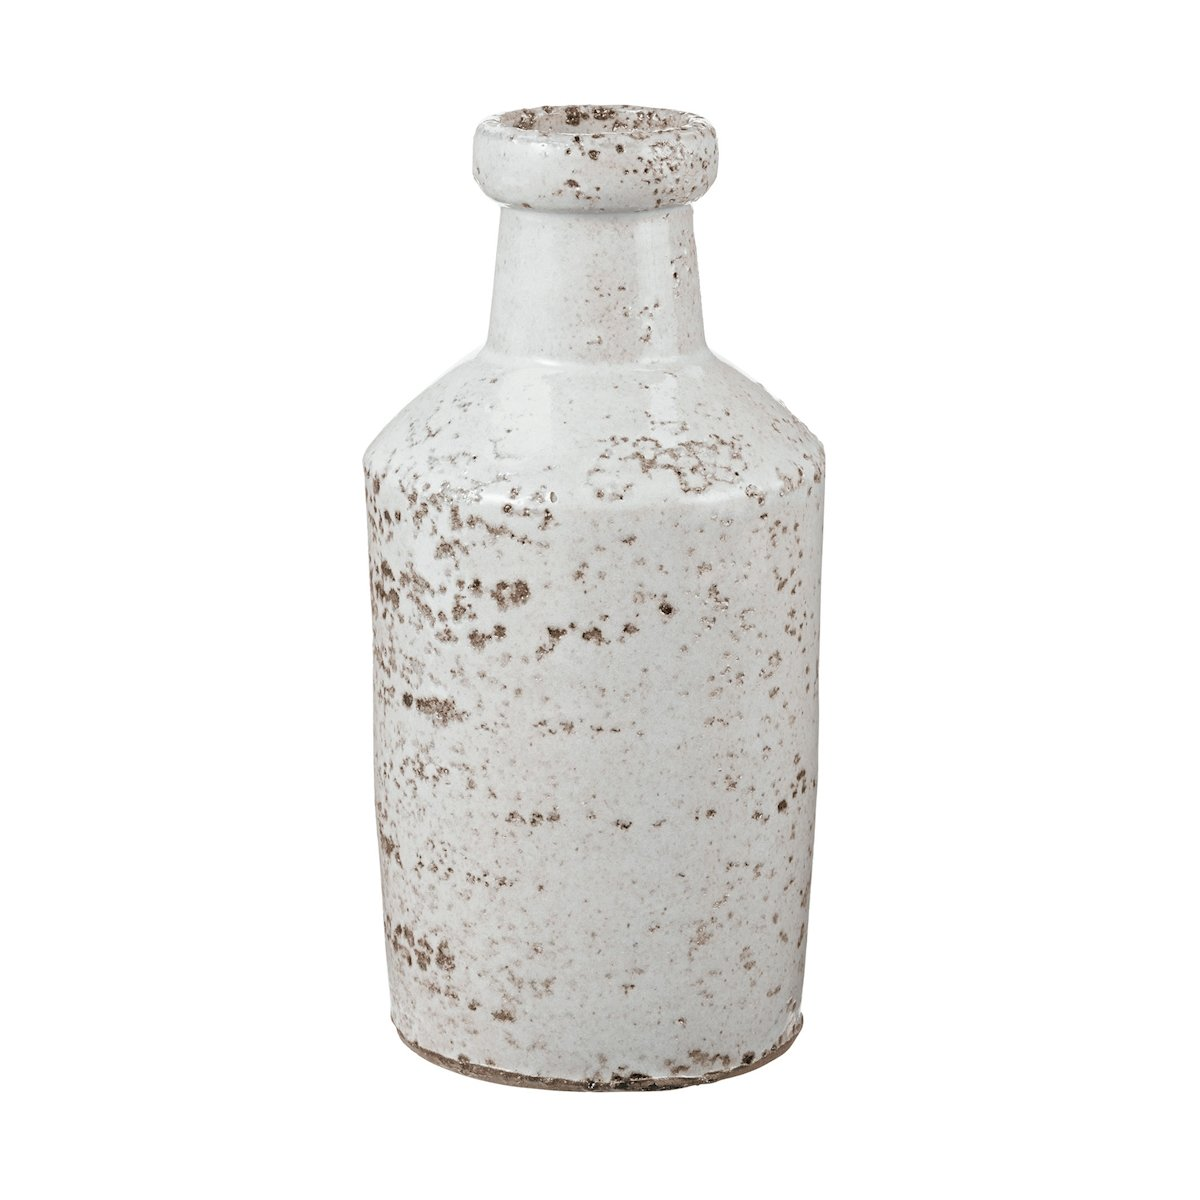 Dimond Home 素朴なミルクボトル One Size ホワイト 857084 B00IIT73AU ホワイト ホワイト